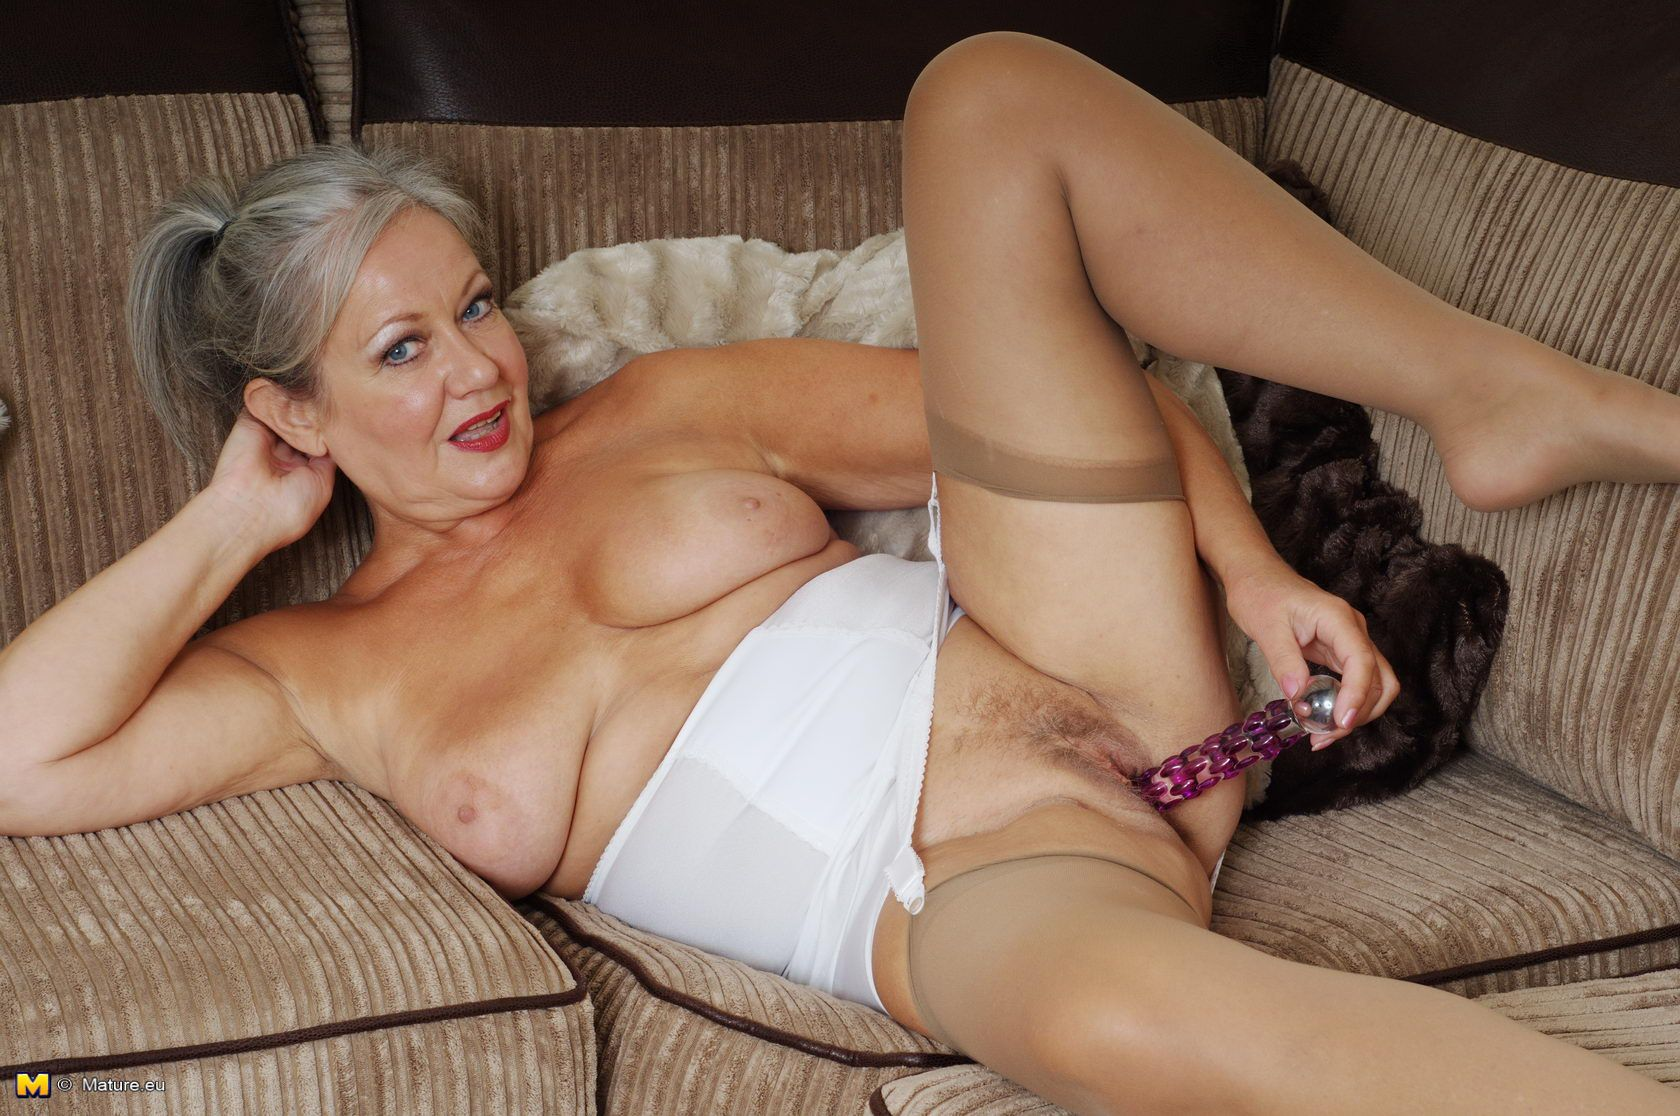 big ass picture sex